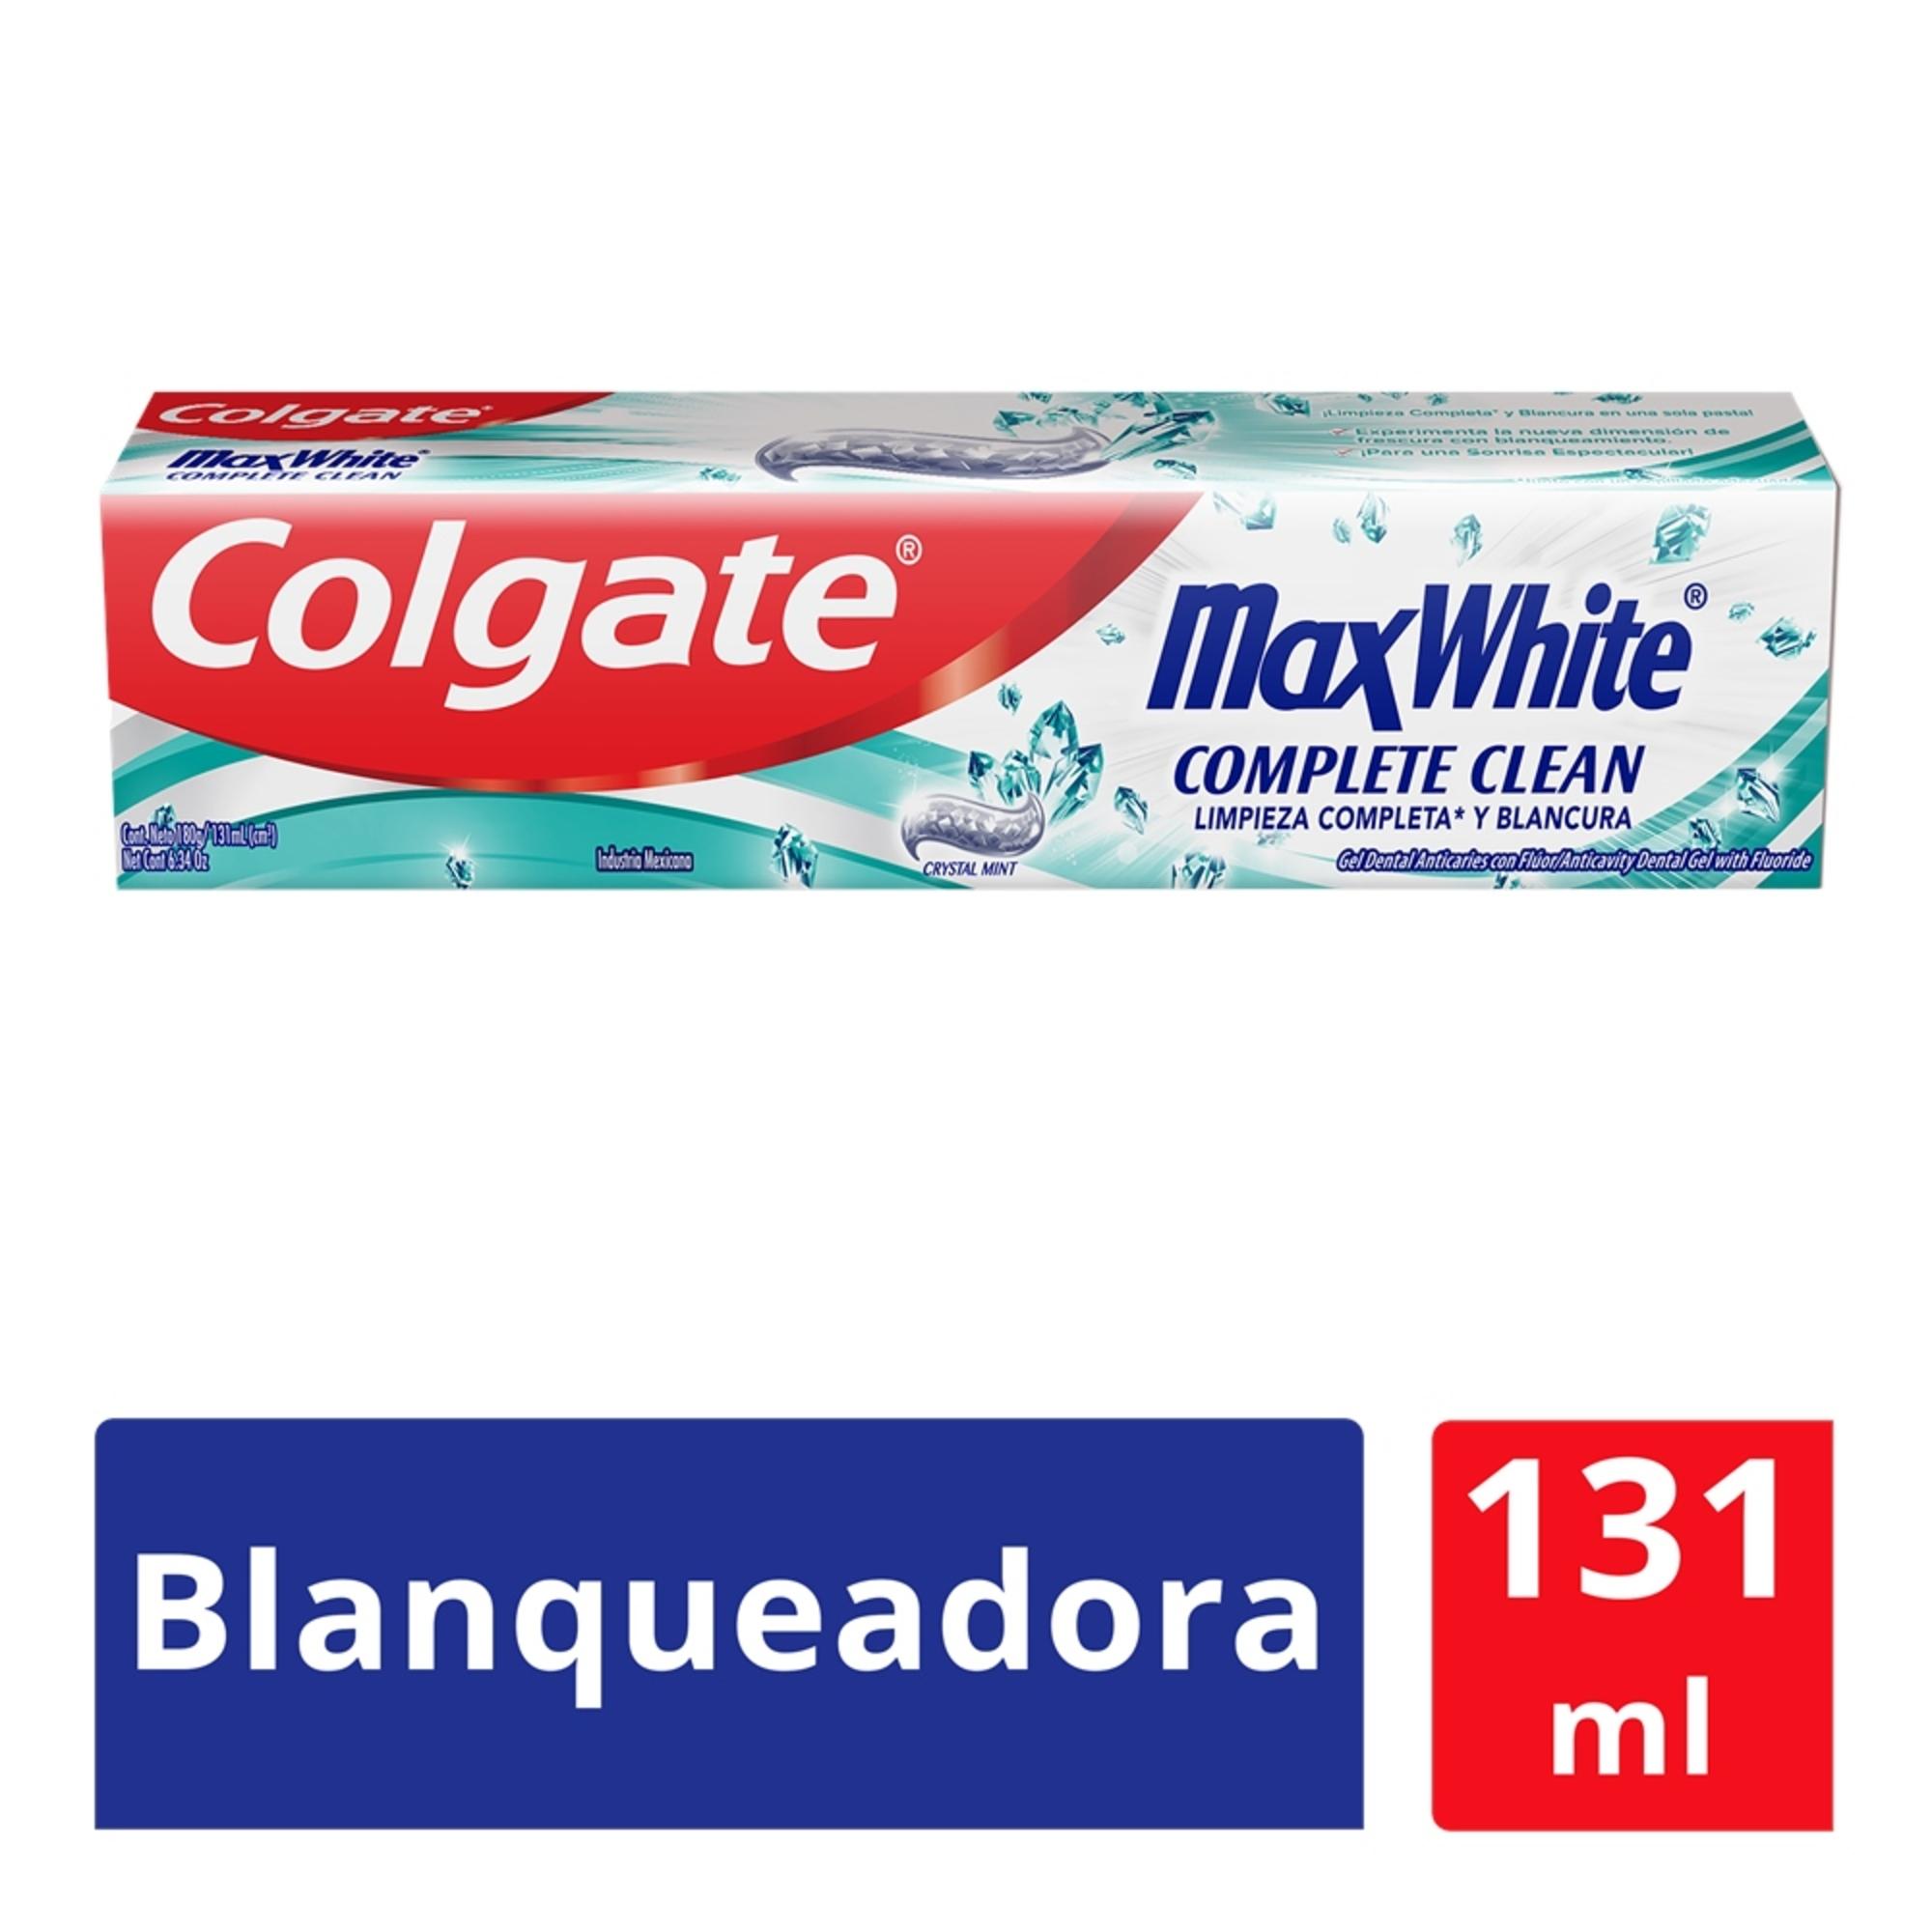 Crema Dental Colgate Maxwhite 131ml